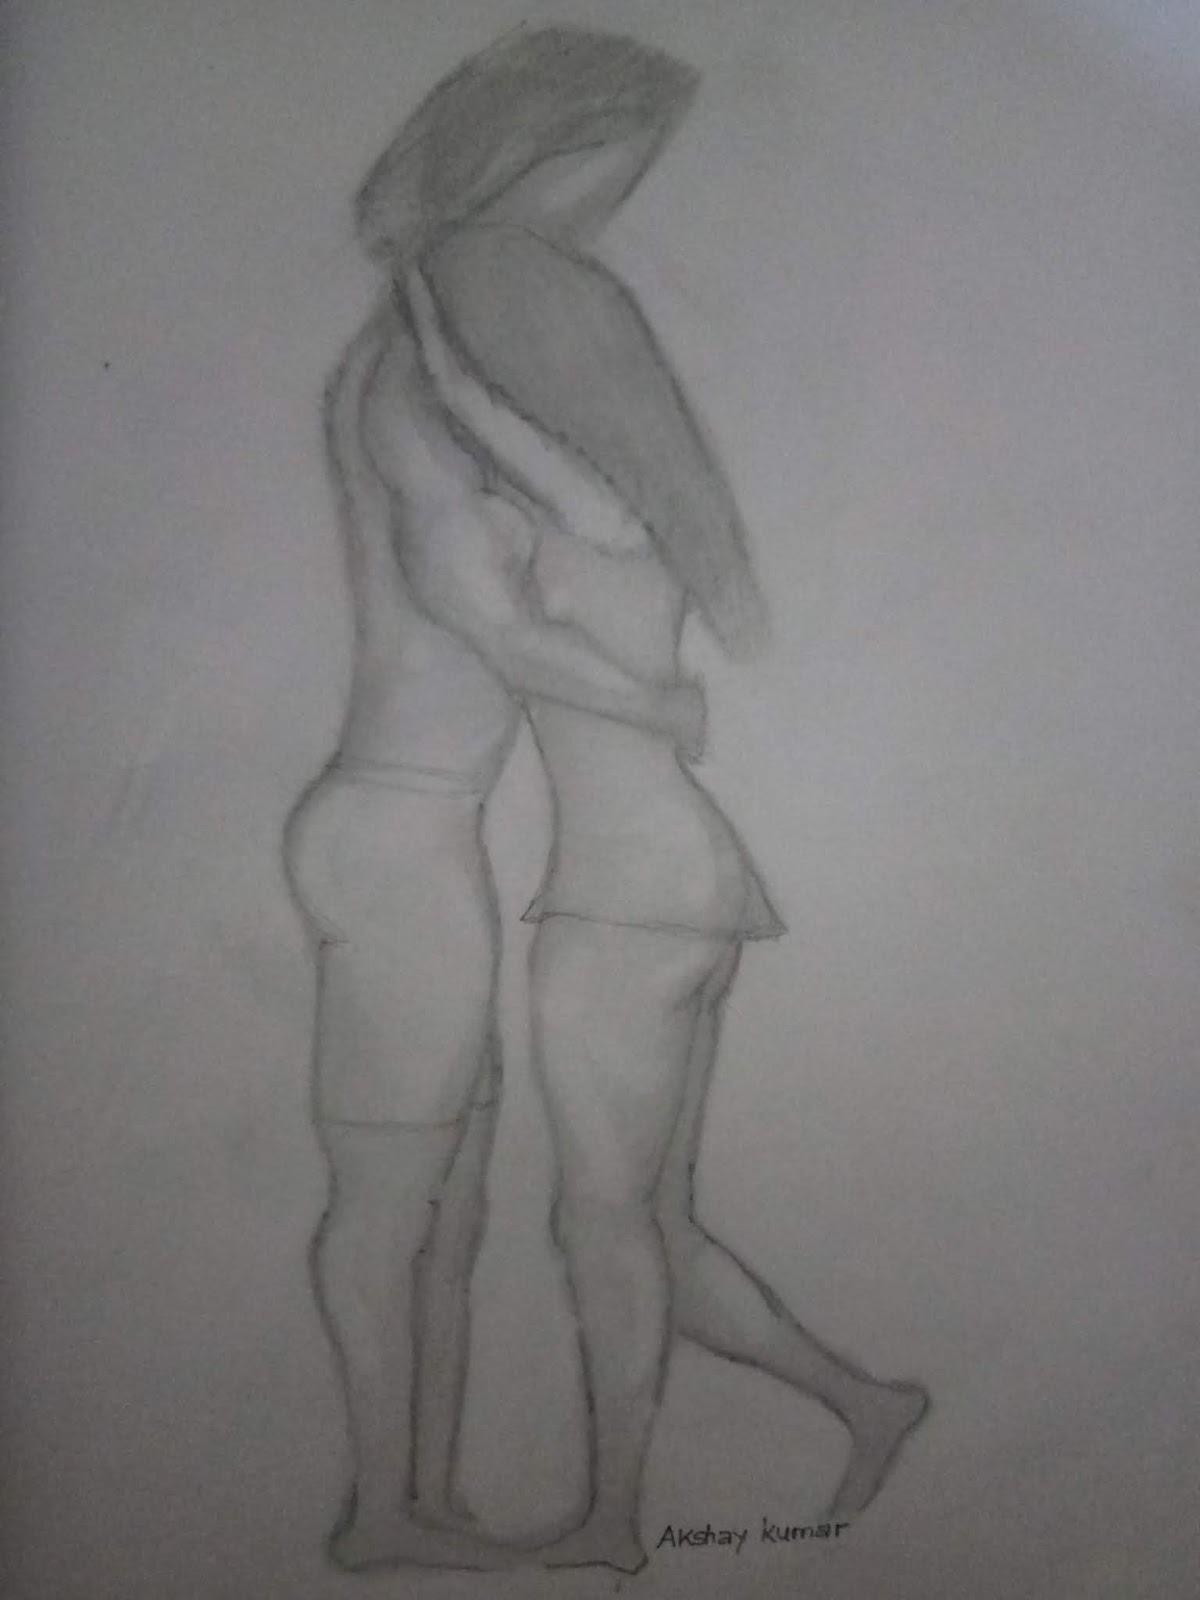 Akshay kumar color pencil drawing of romantic love couple